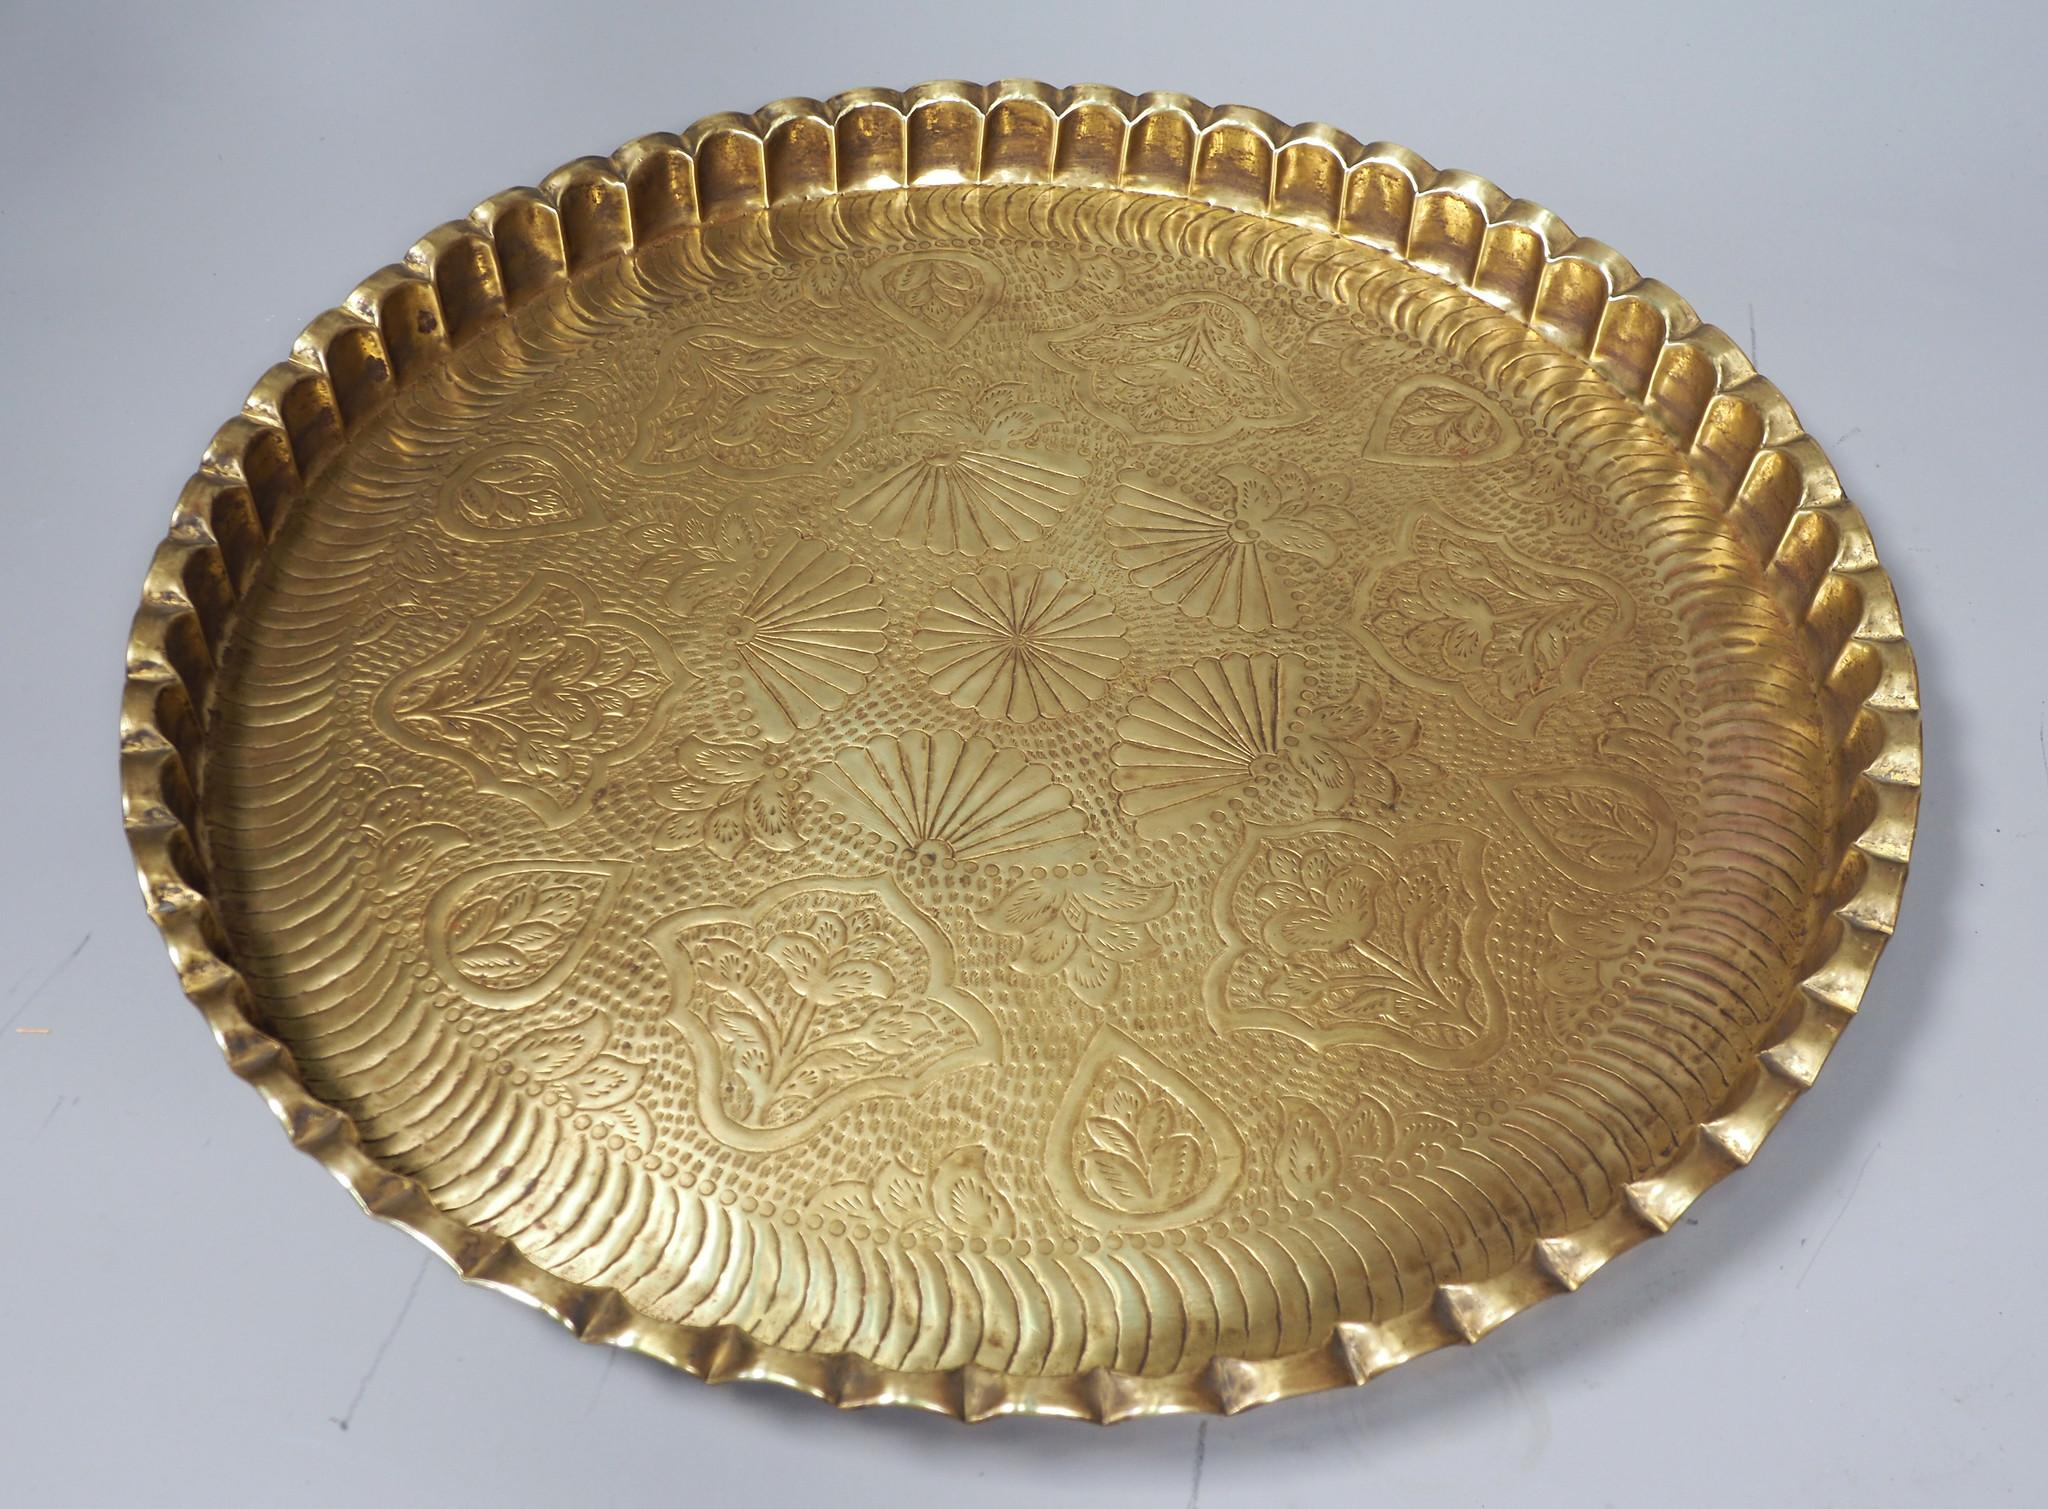 55 cm Ø  osmanisch ägyptisch marokkanisch orient Messing tablett Teetisch beisteltisch Afghanistan   21/F